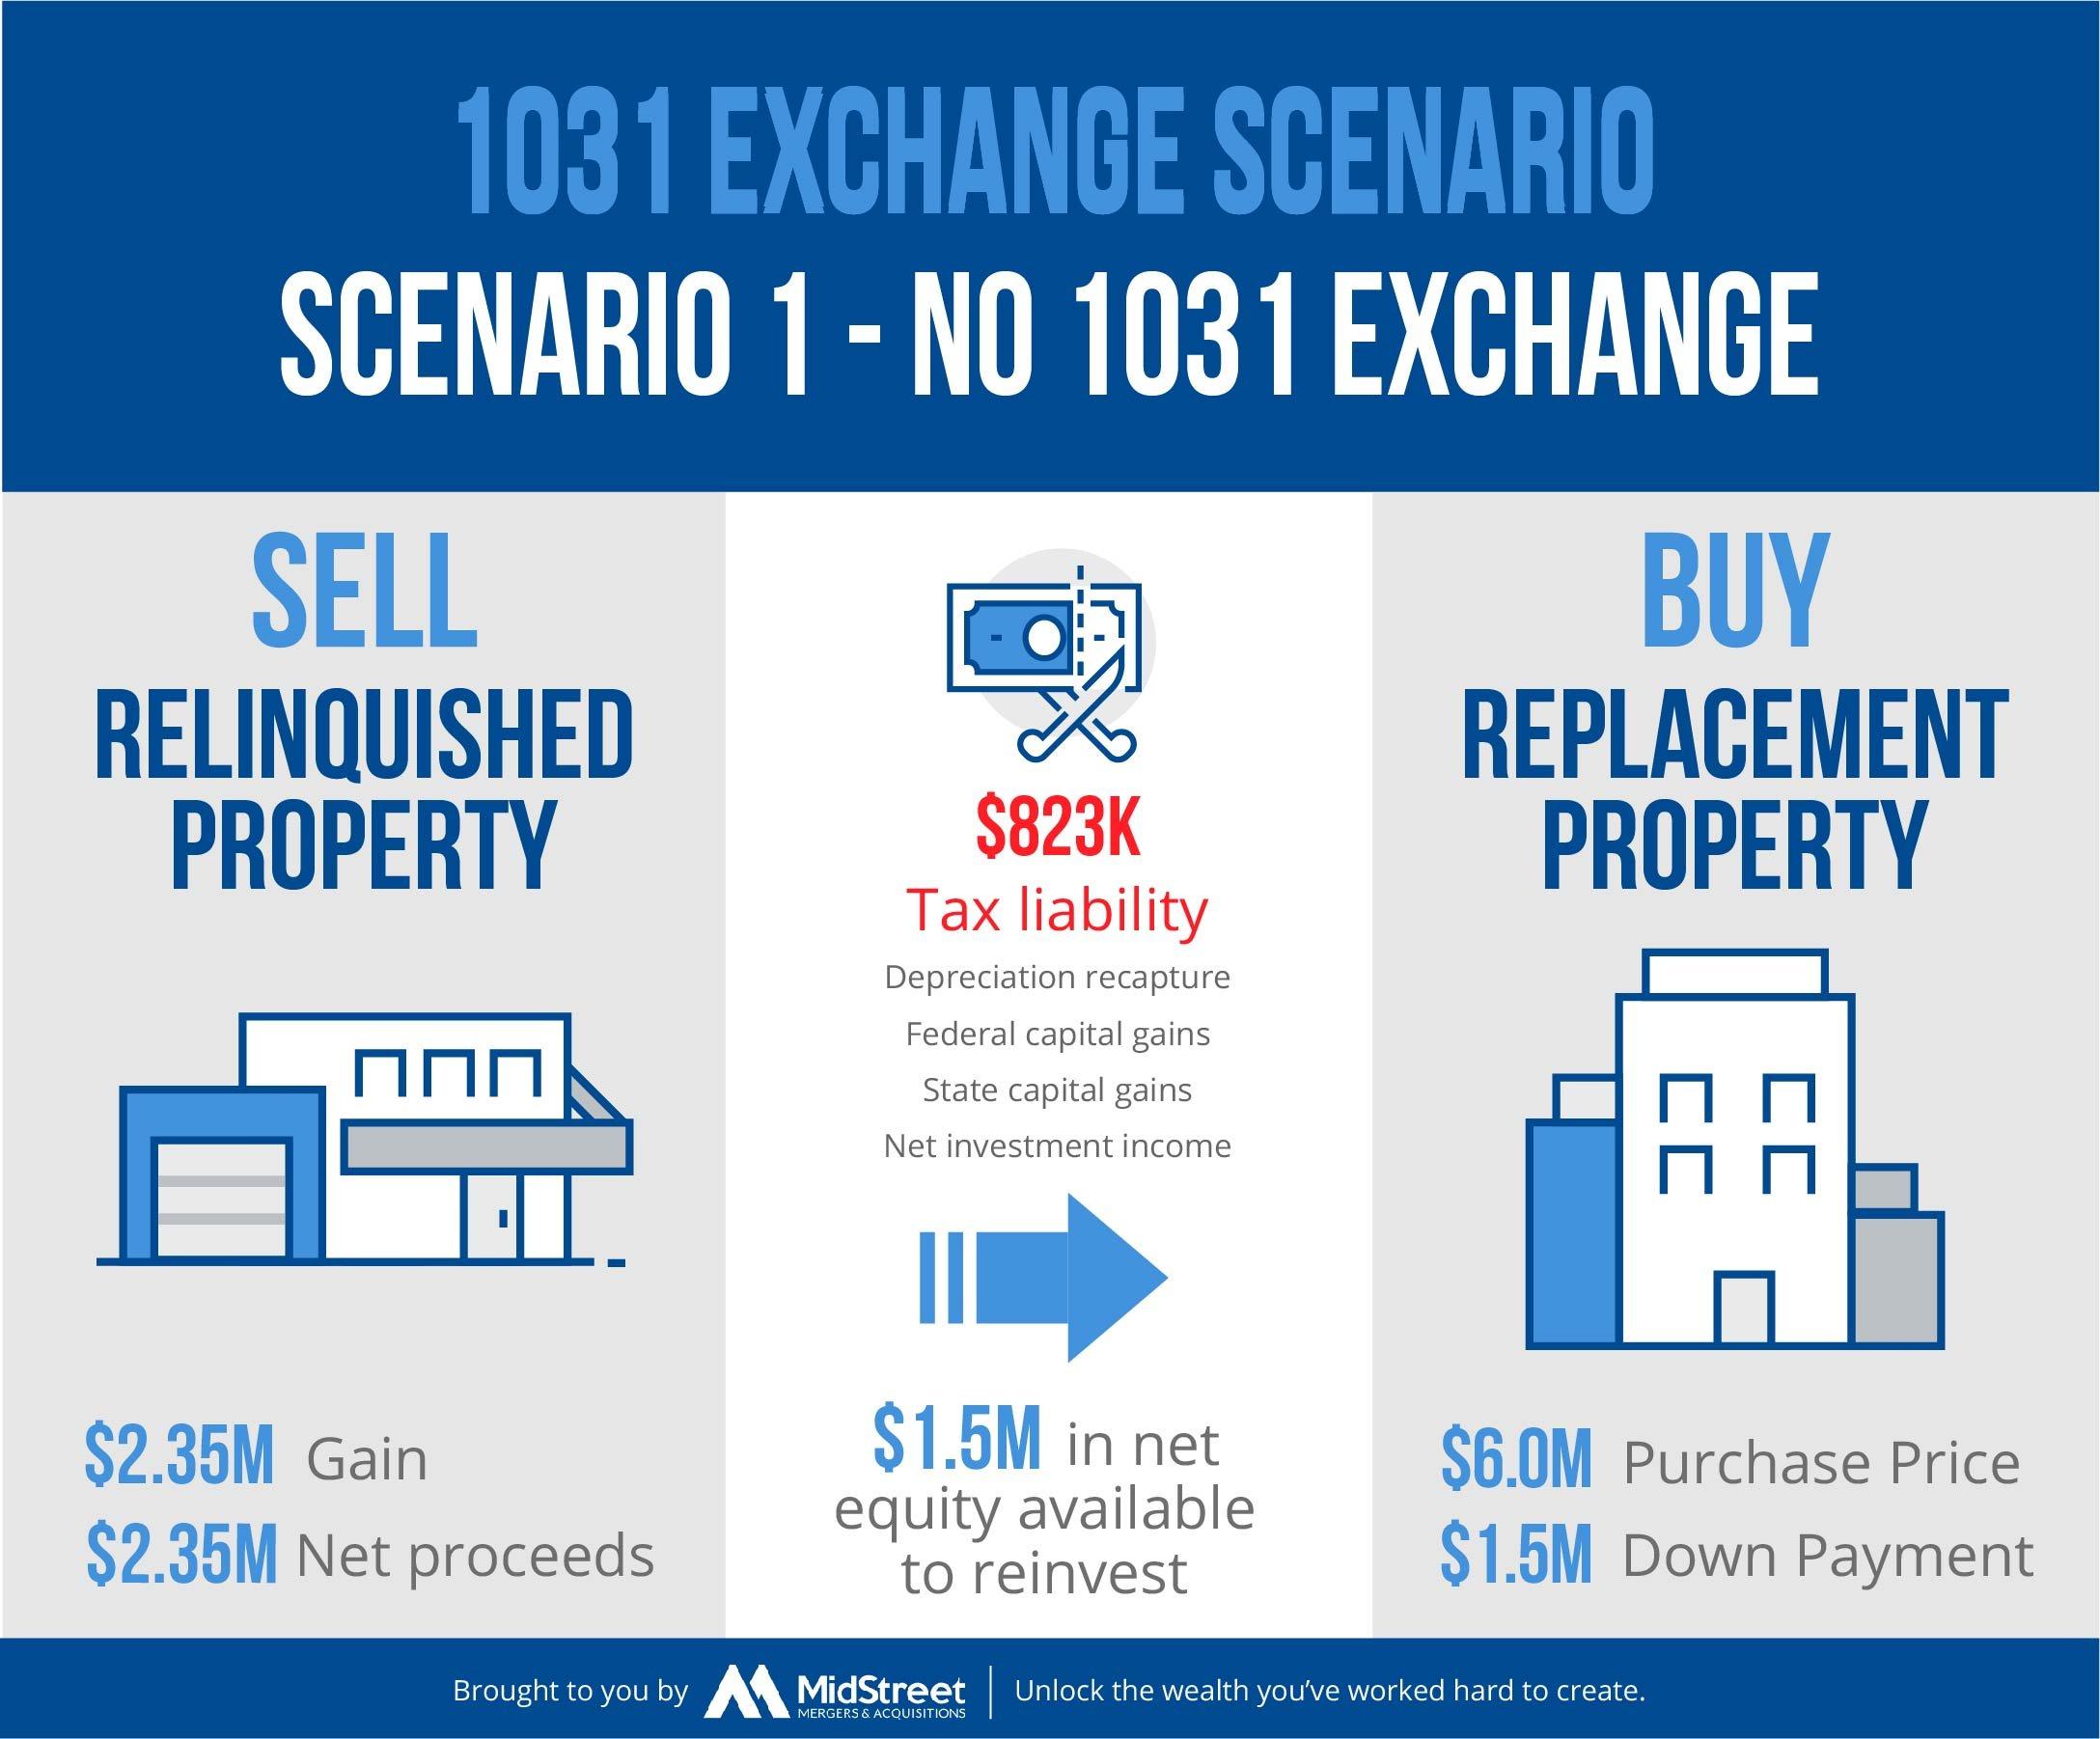 1031-Exchange Scenario 1